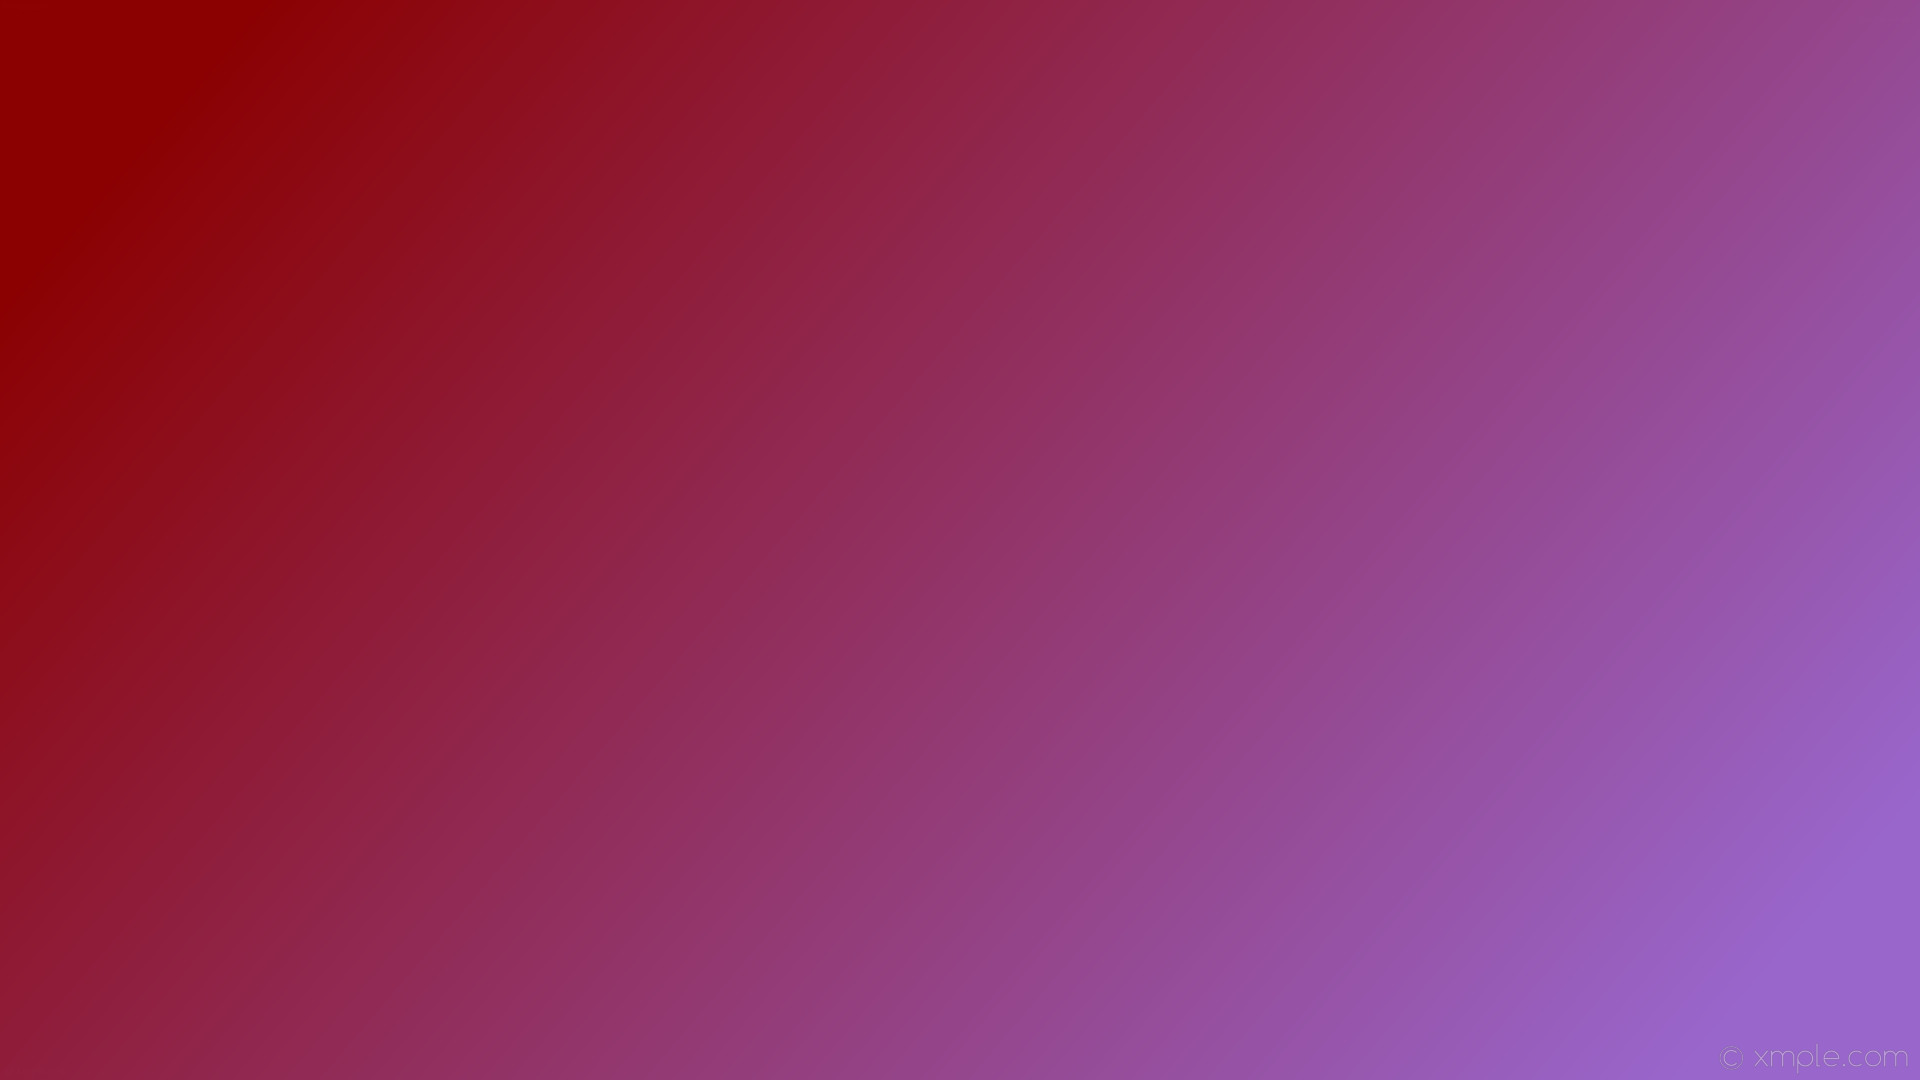 wallpaper gradient linear red purple dark red amethyst #8b0000 #9966cc 165°